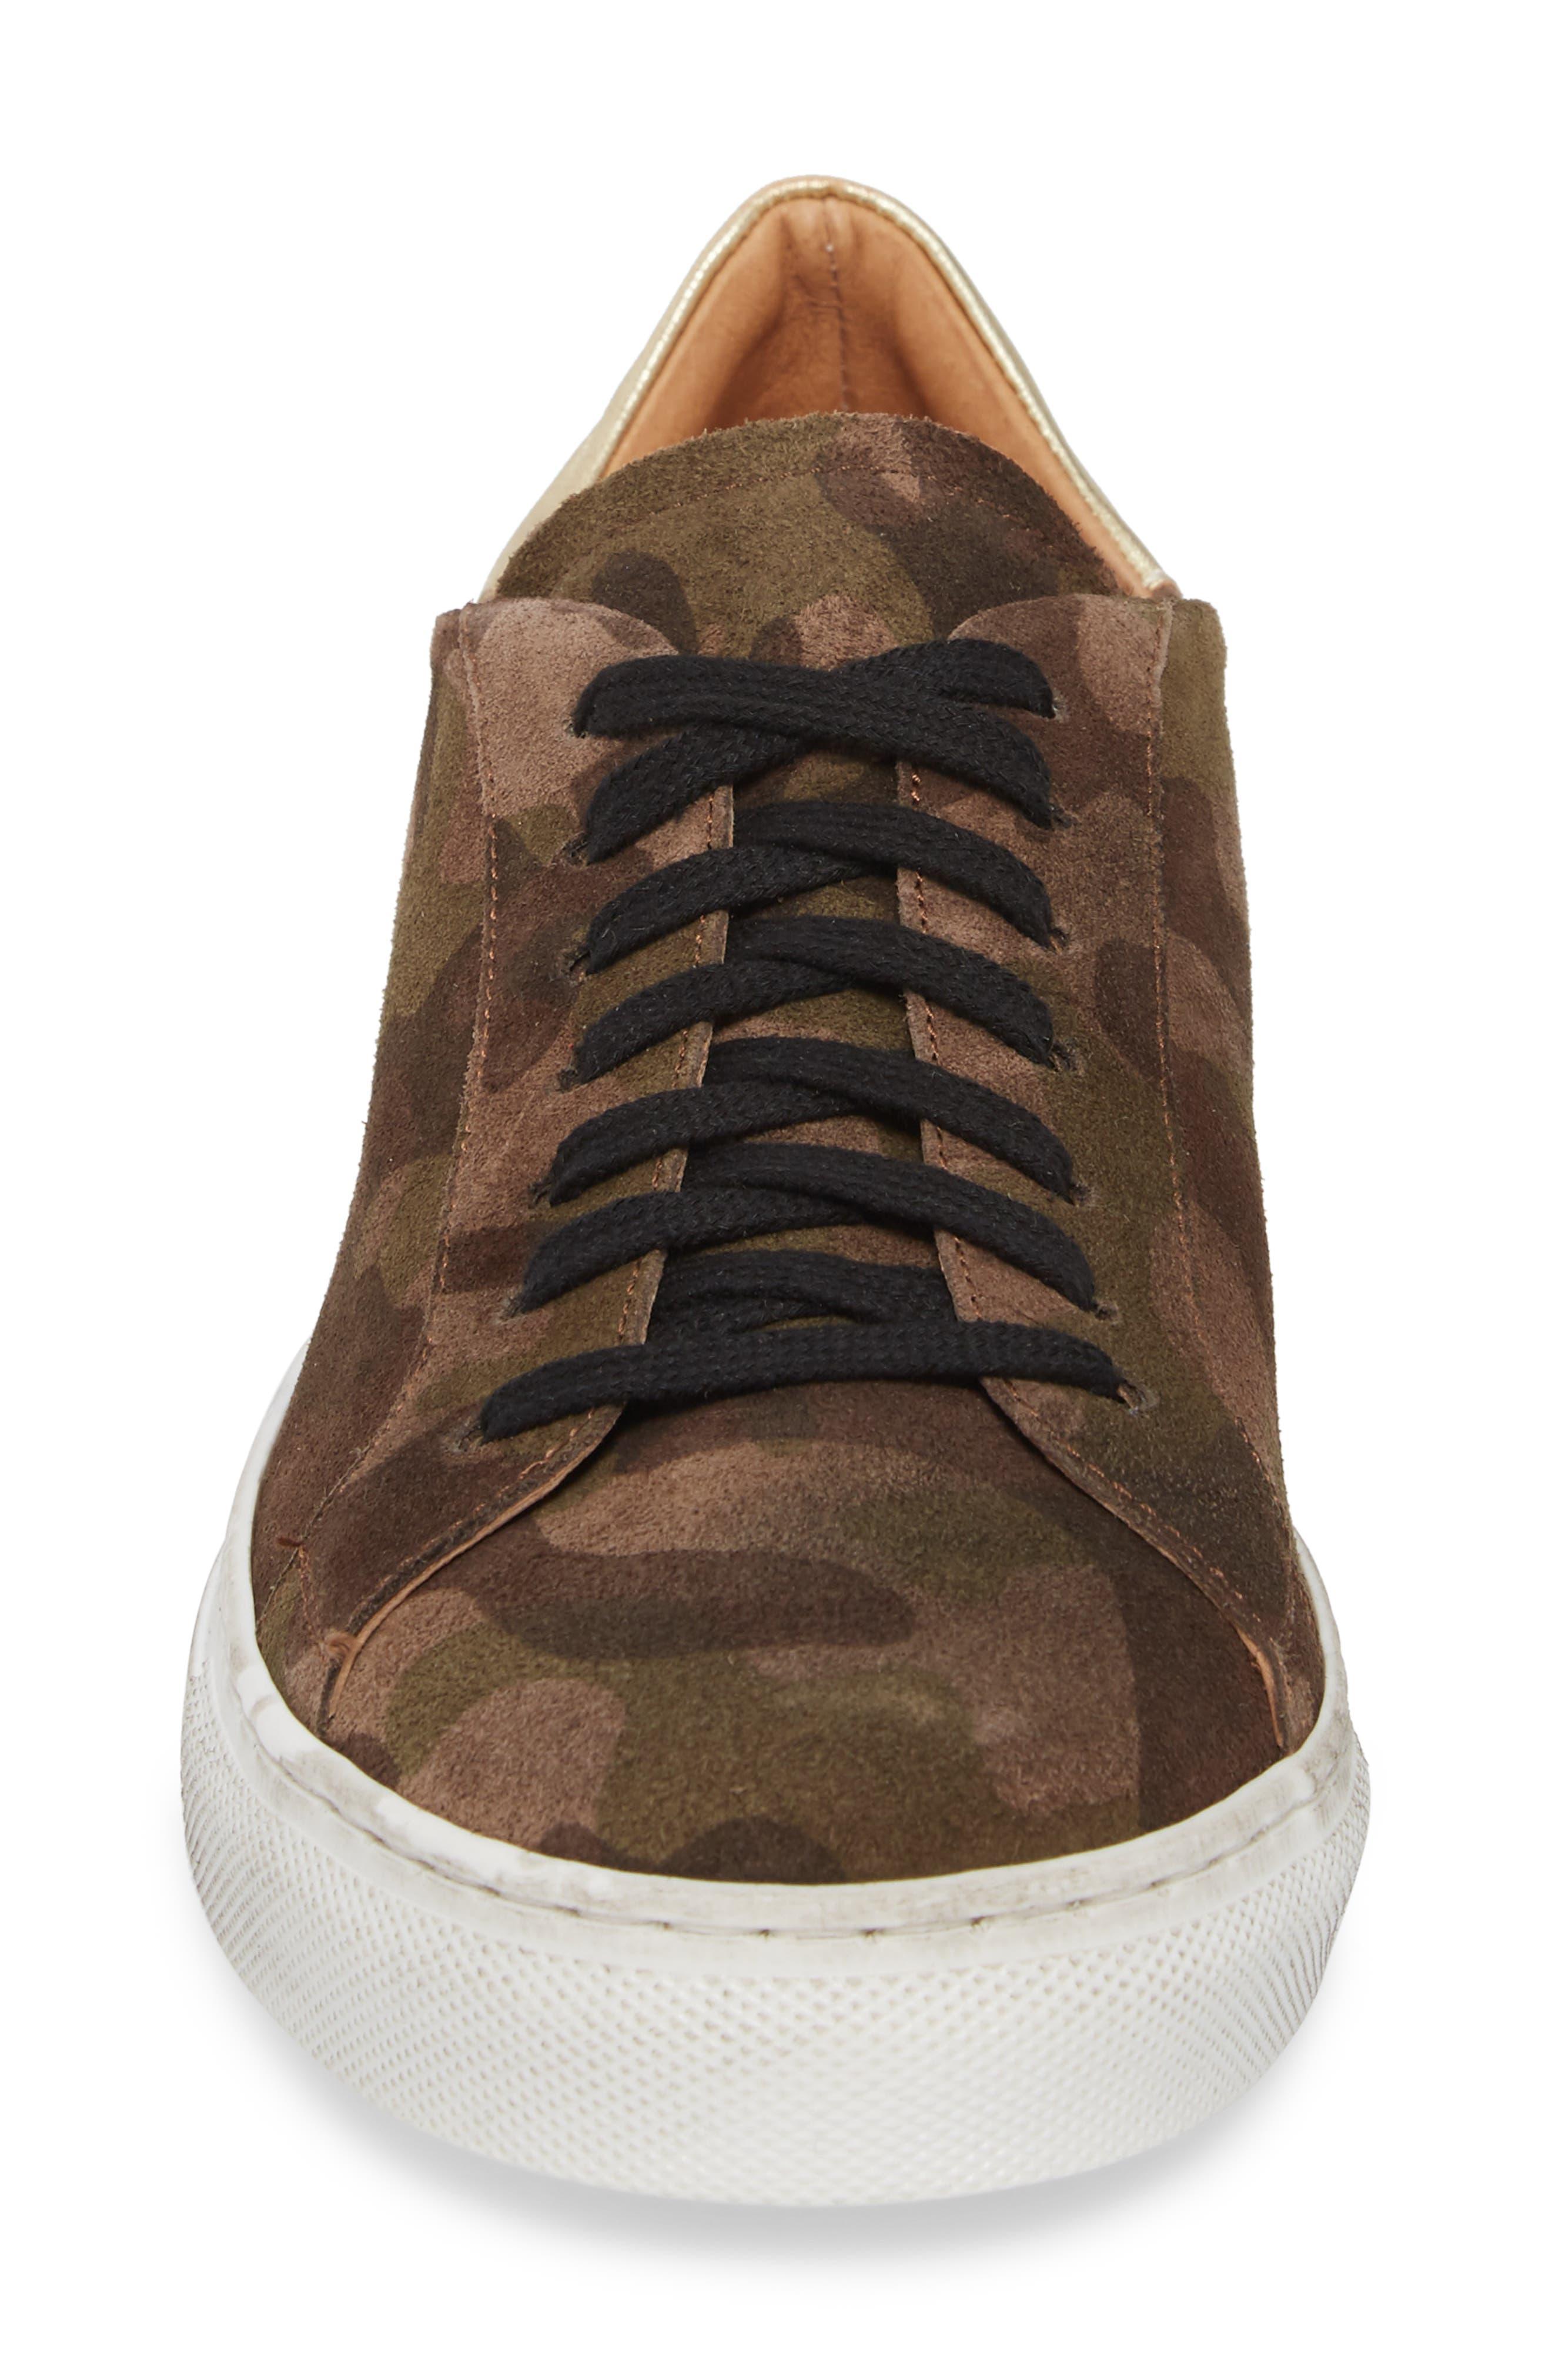 Orissa Sneaker,                             Alternate thumbnail 4, color,                             MILITARY PRINT SUEDE